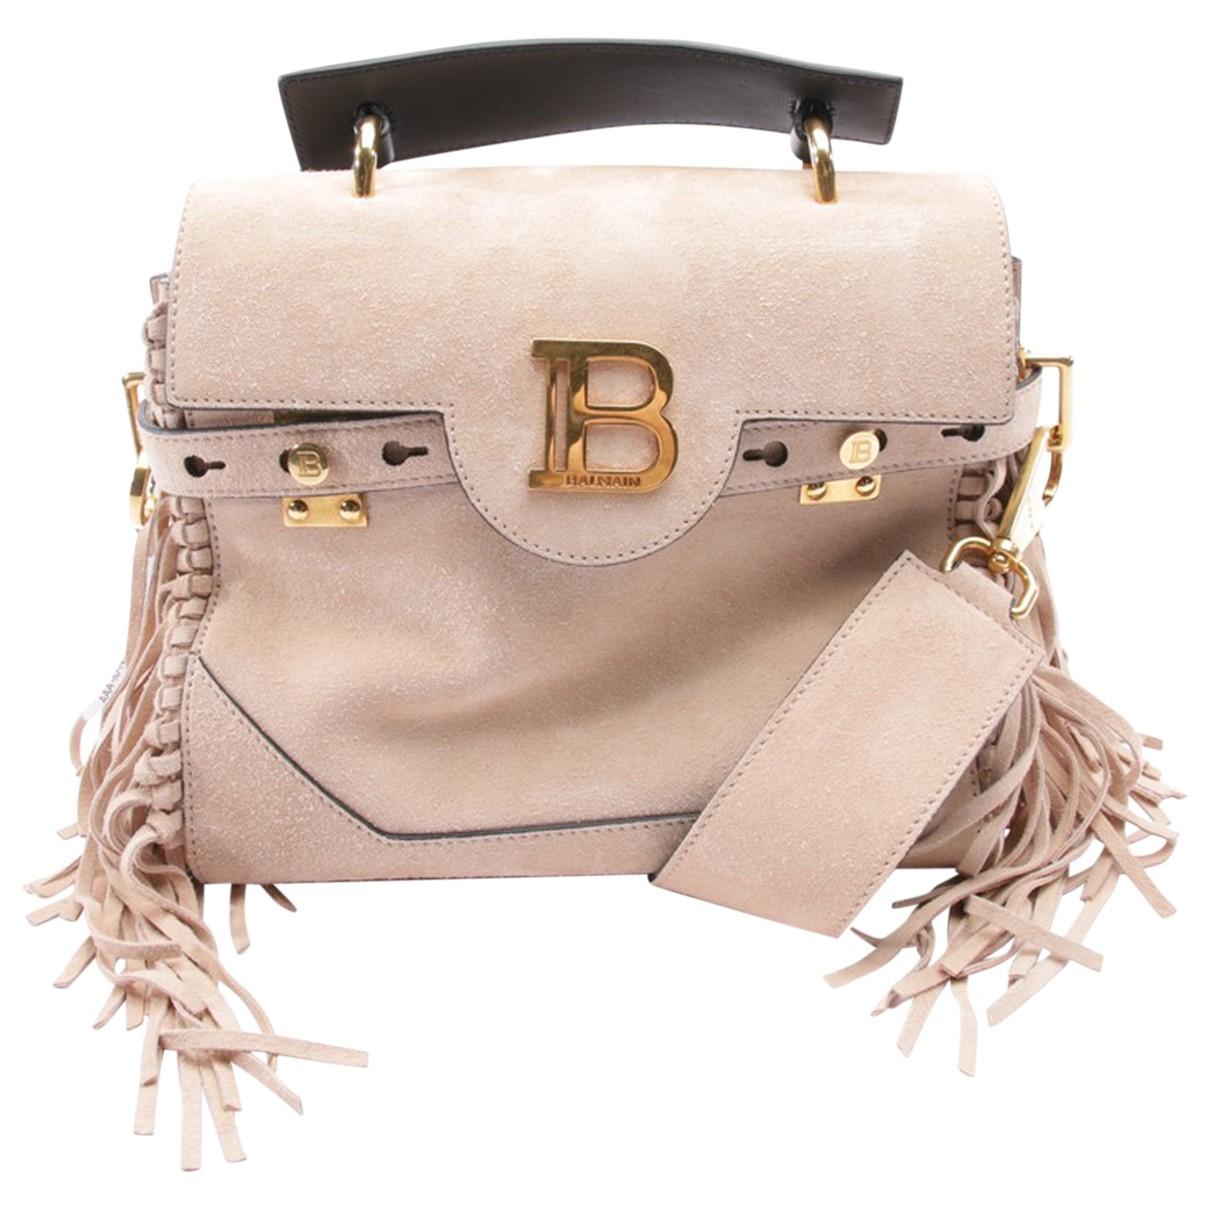 Balmain \N Beige Leather handbag for Women \N